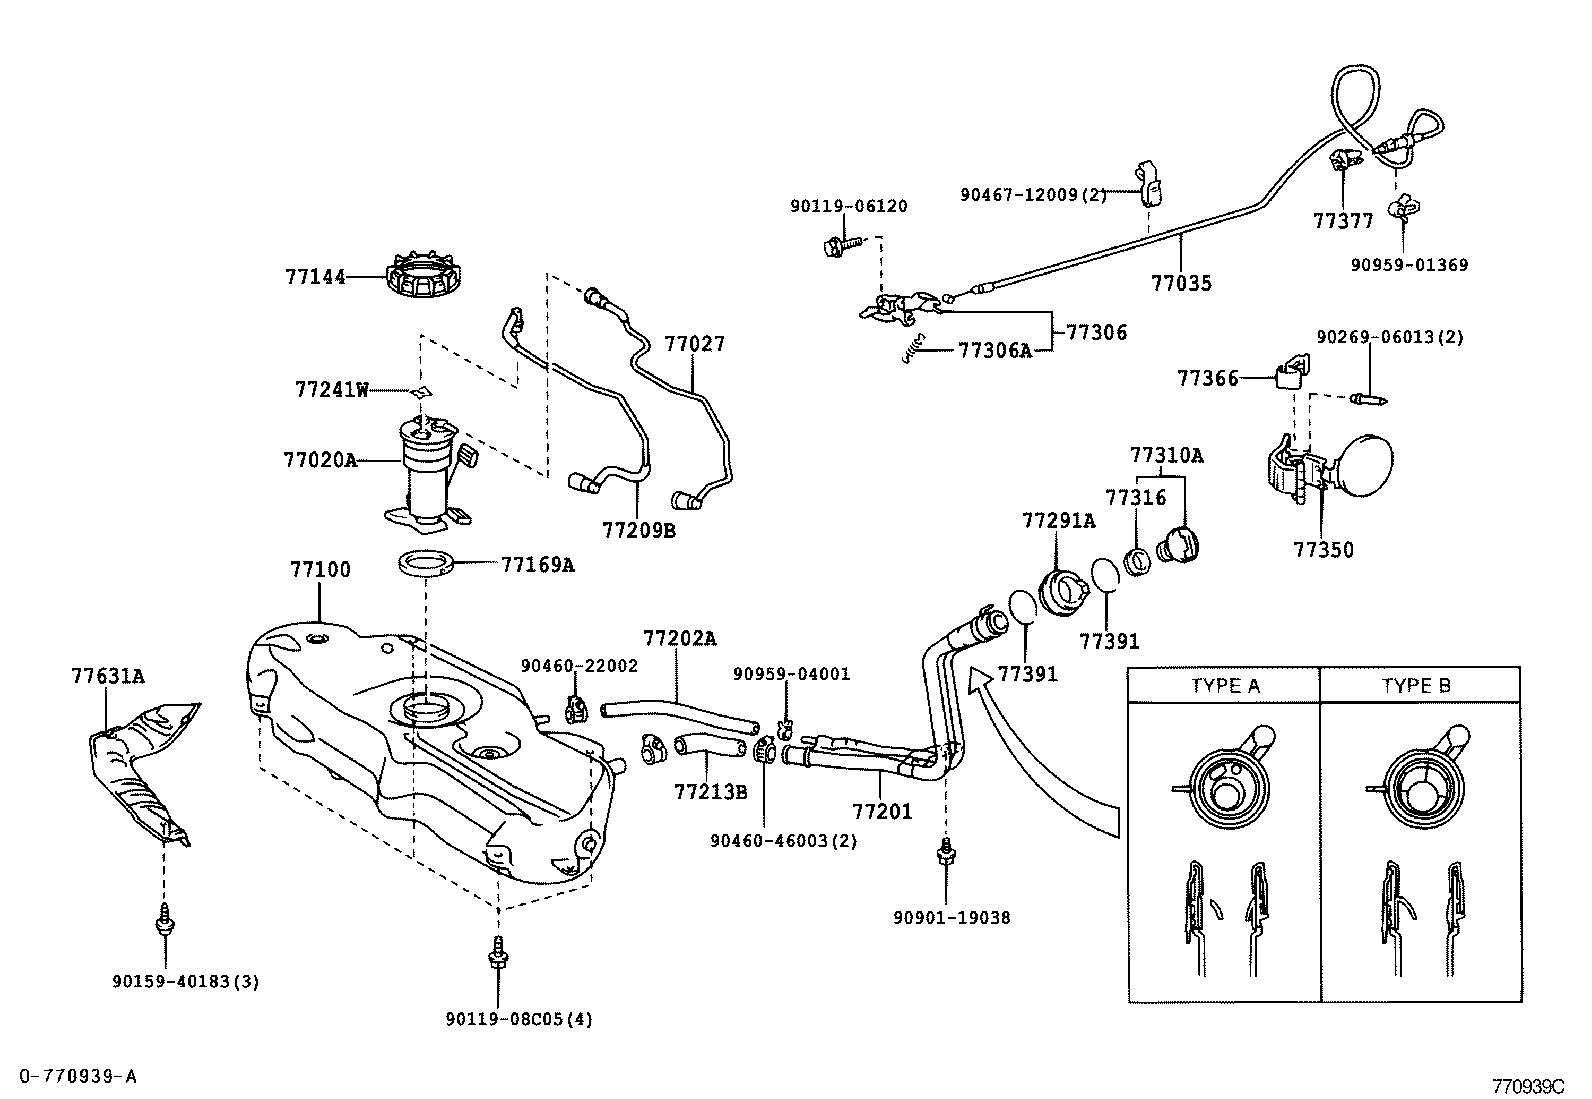 toyota yarisscp12l-cgmgkw - body